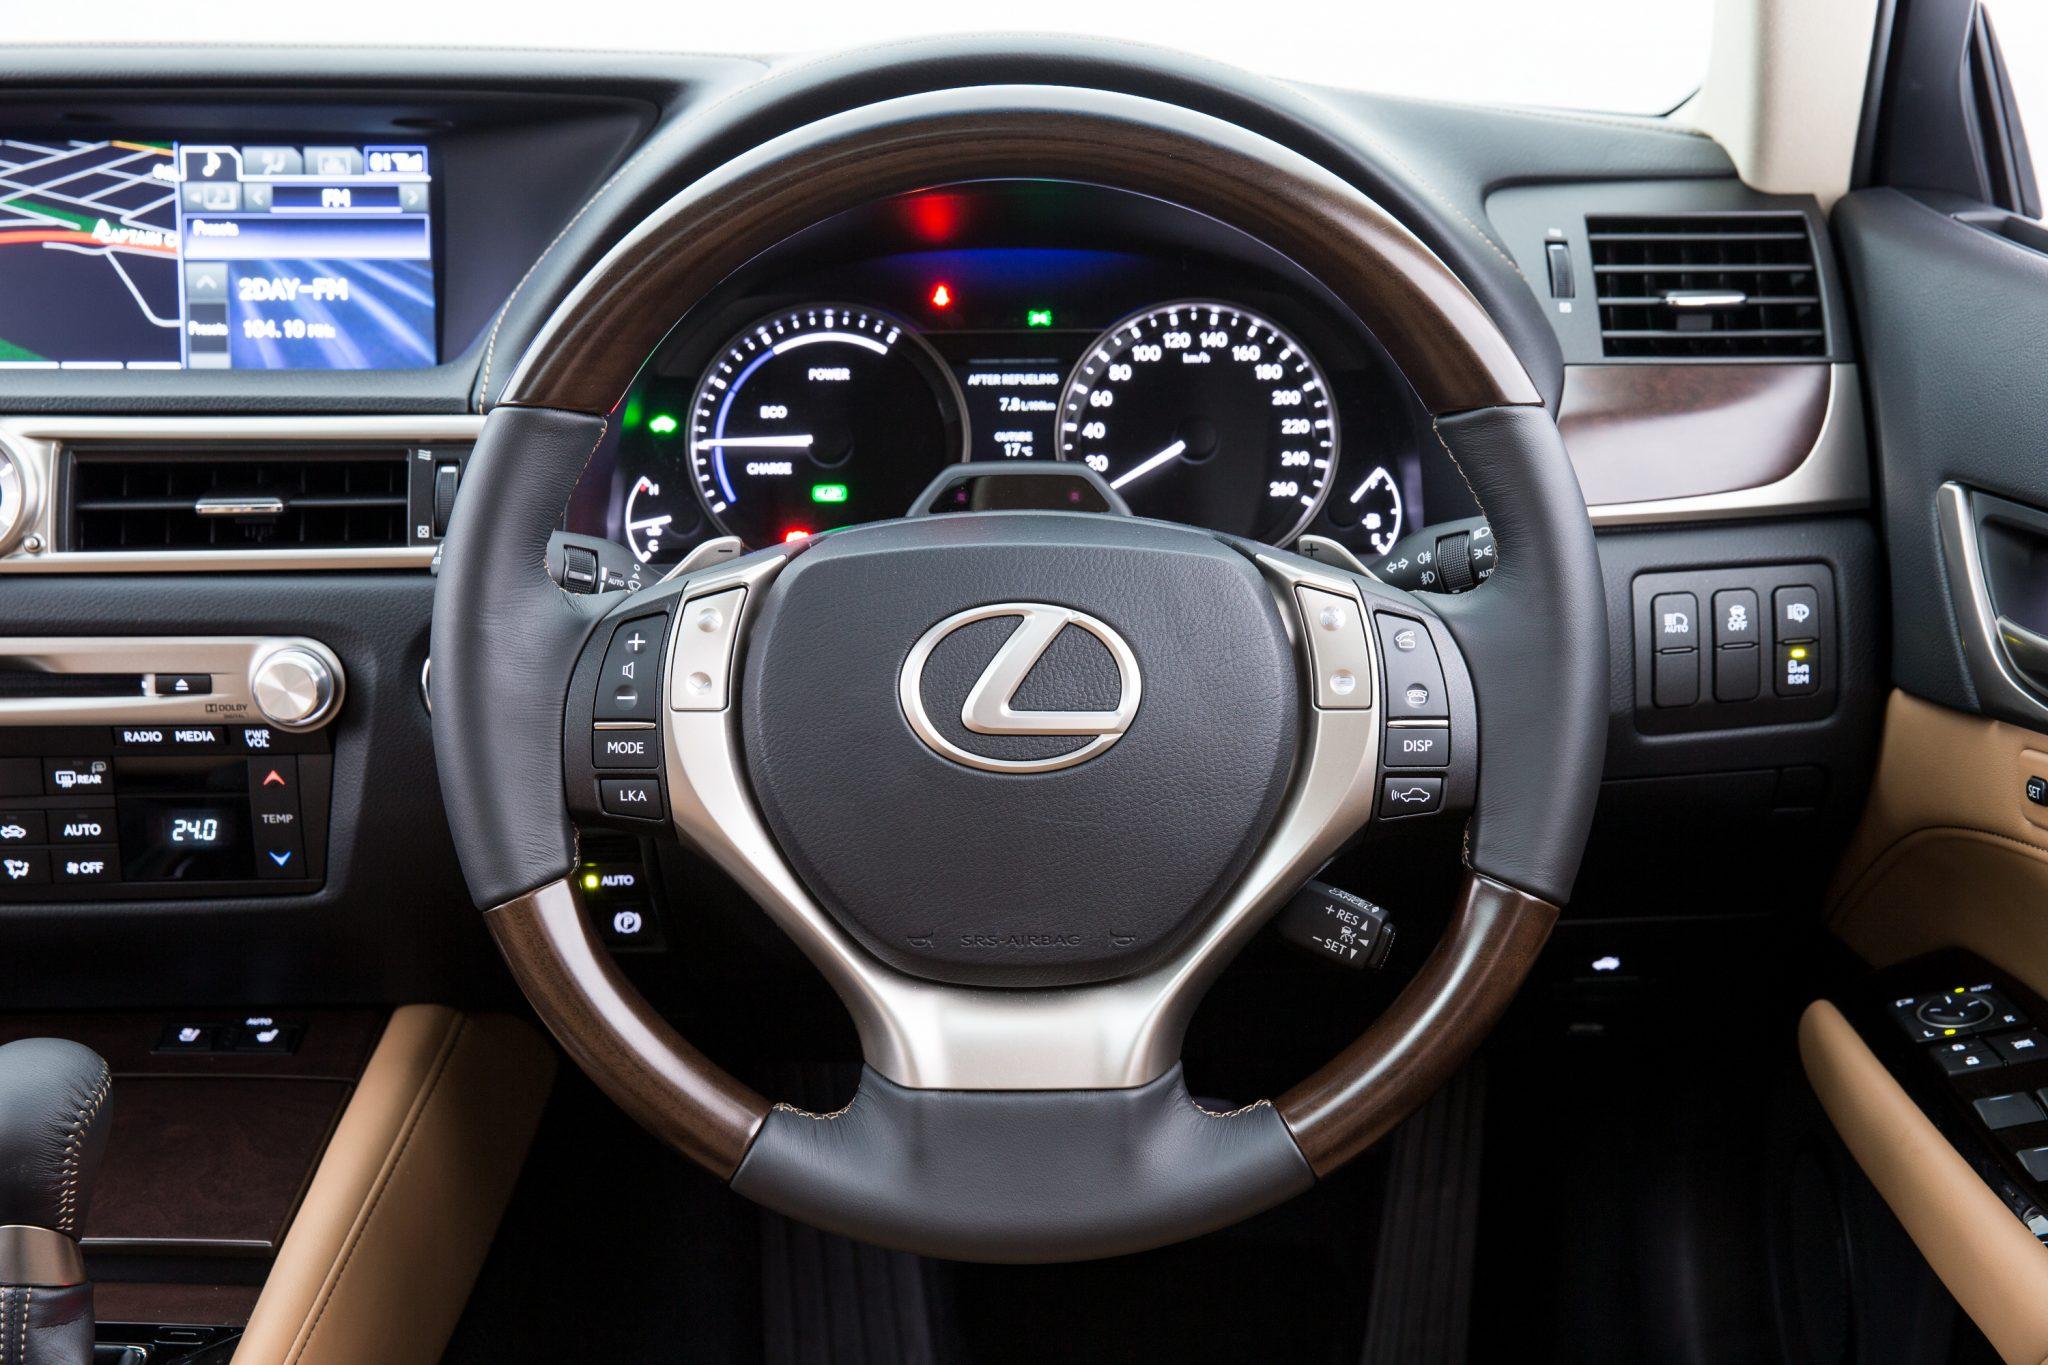 Lexus Gs 300h Interior Dashboard Forcegt Com